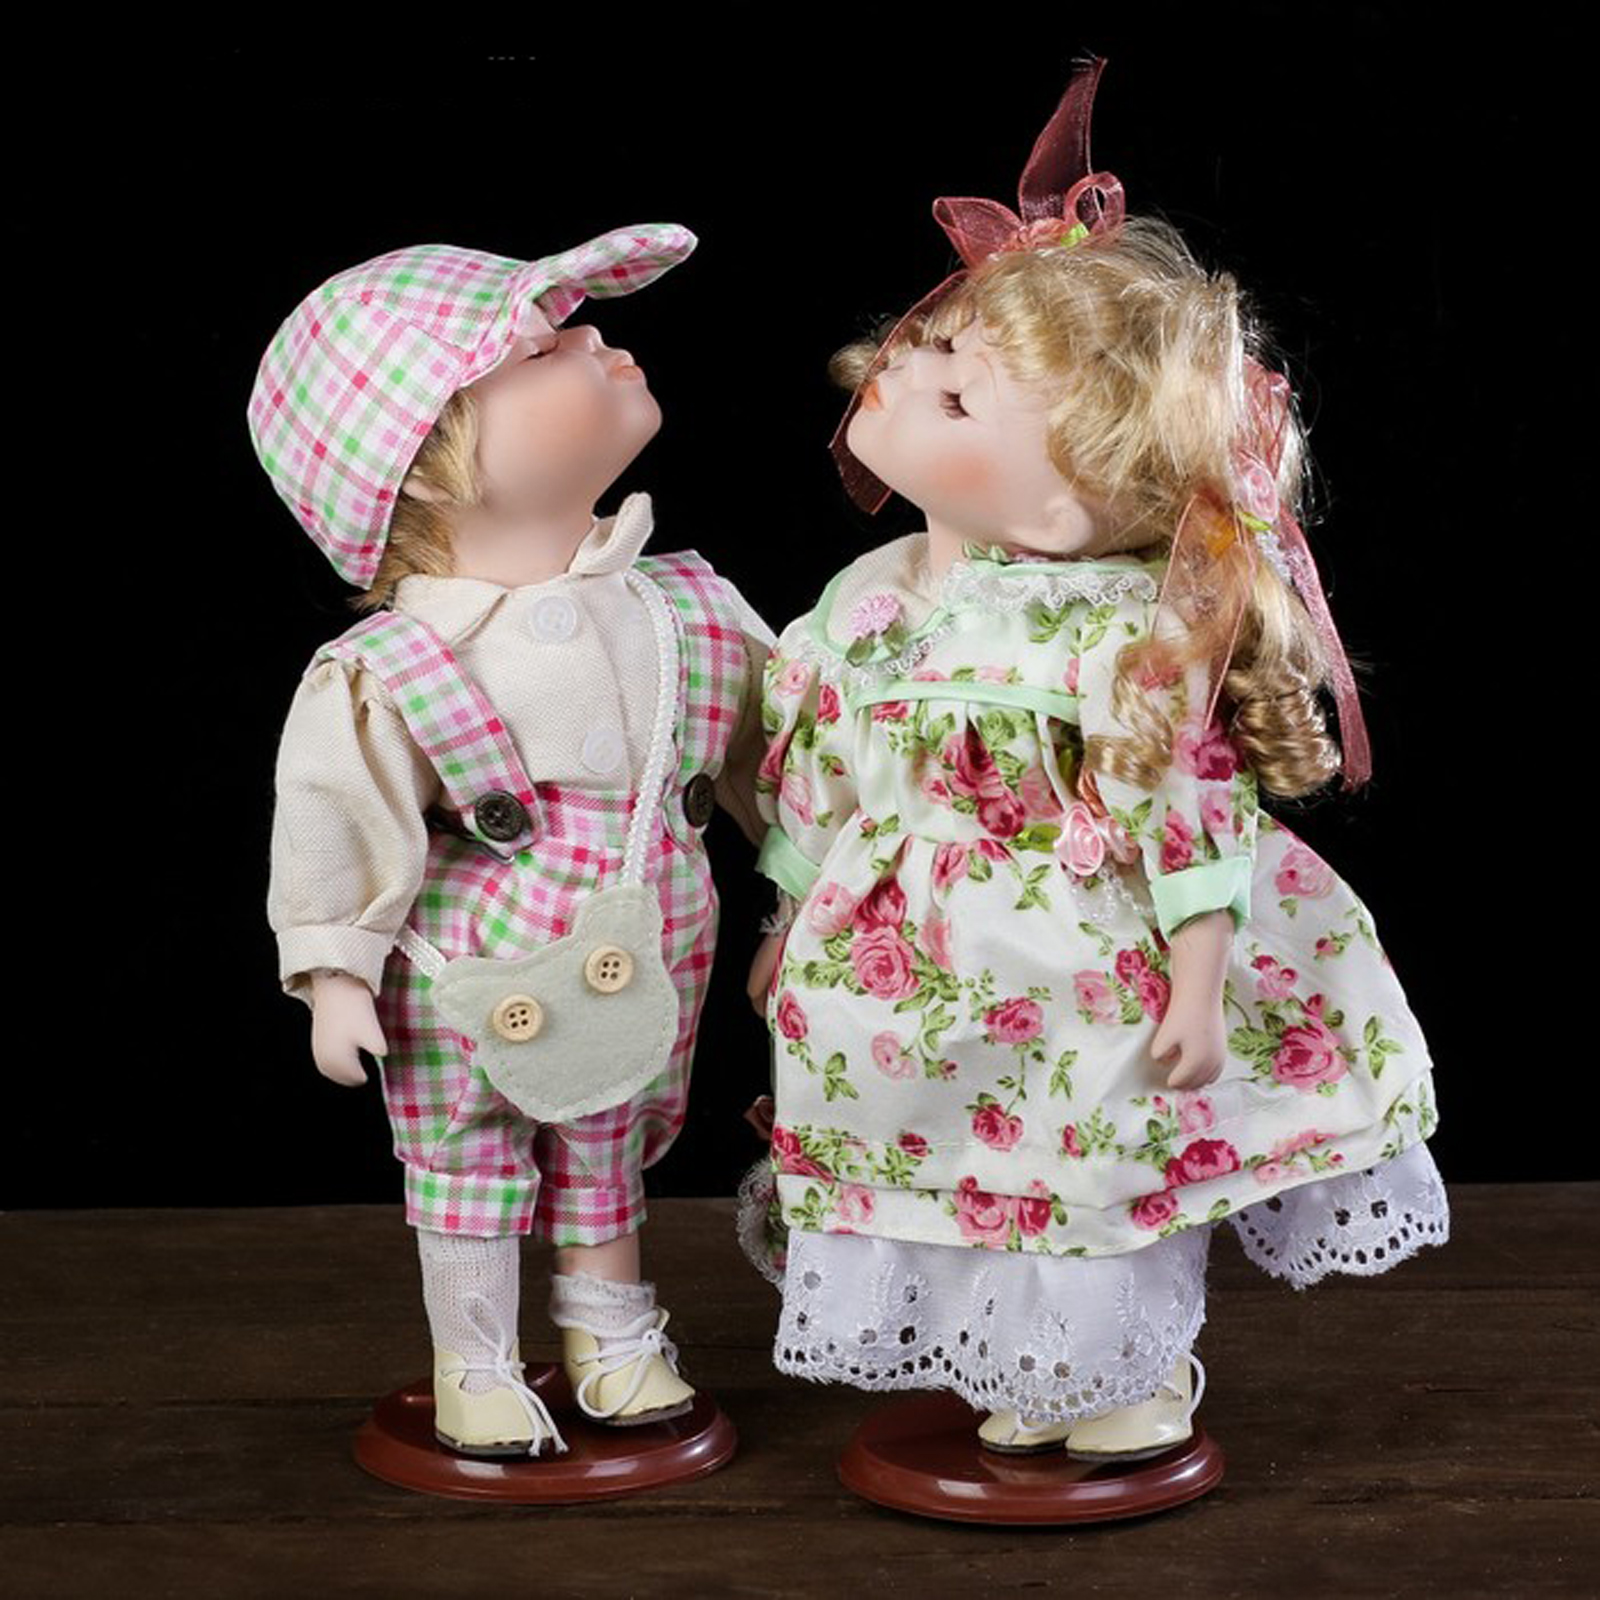 очень куклы поцелуйчики фото фото, картинки обои